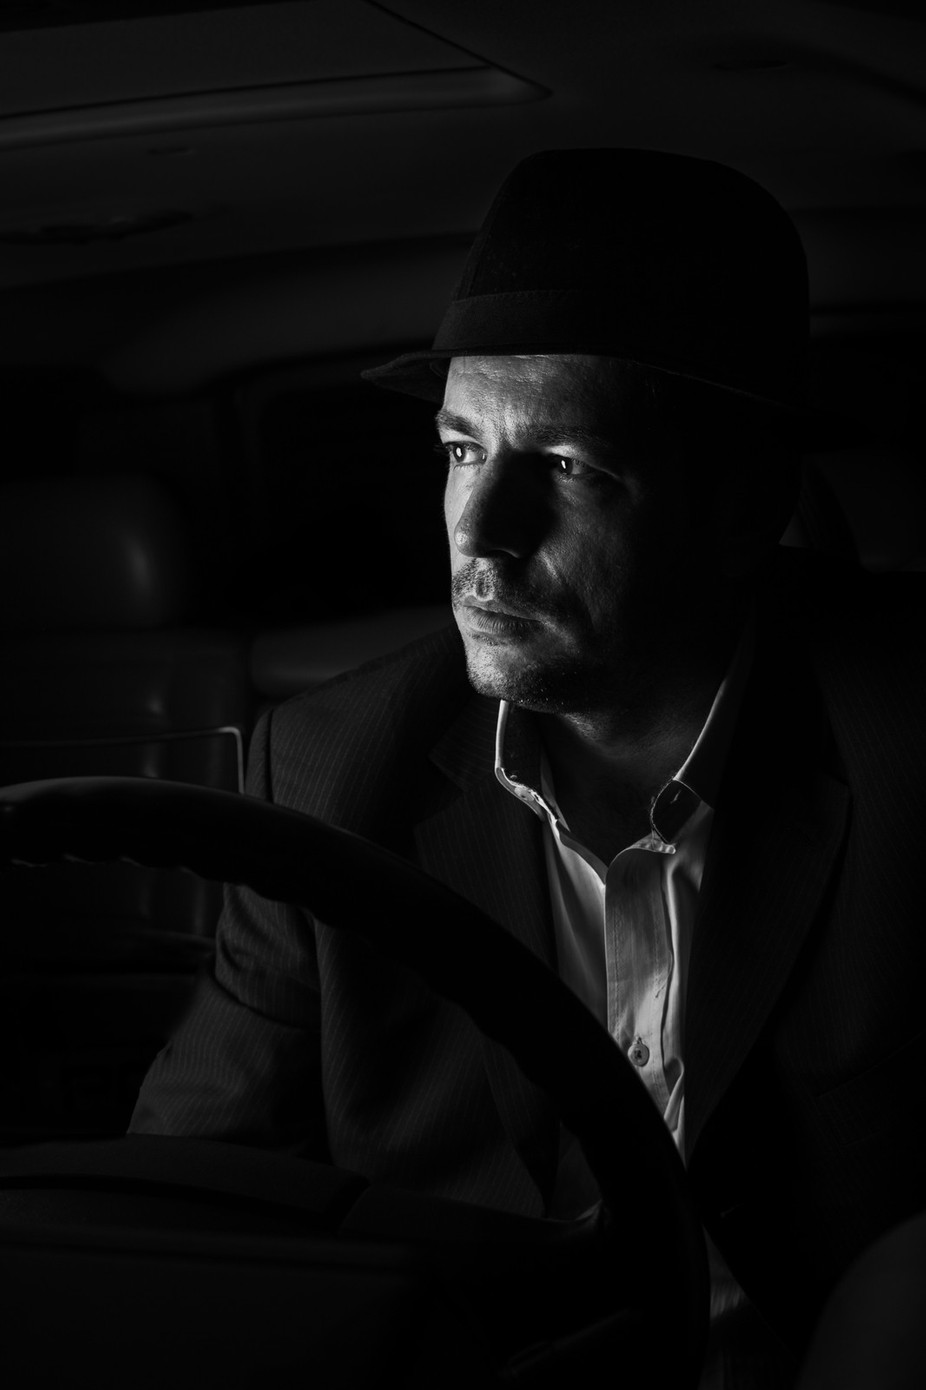 Secret Service by Misho5z - Dark Portraits Photo Contest